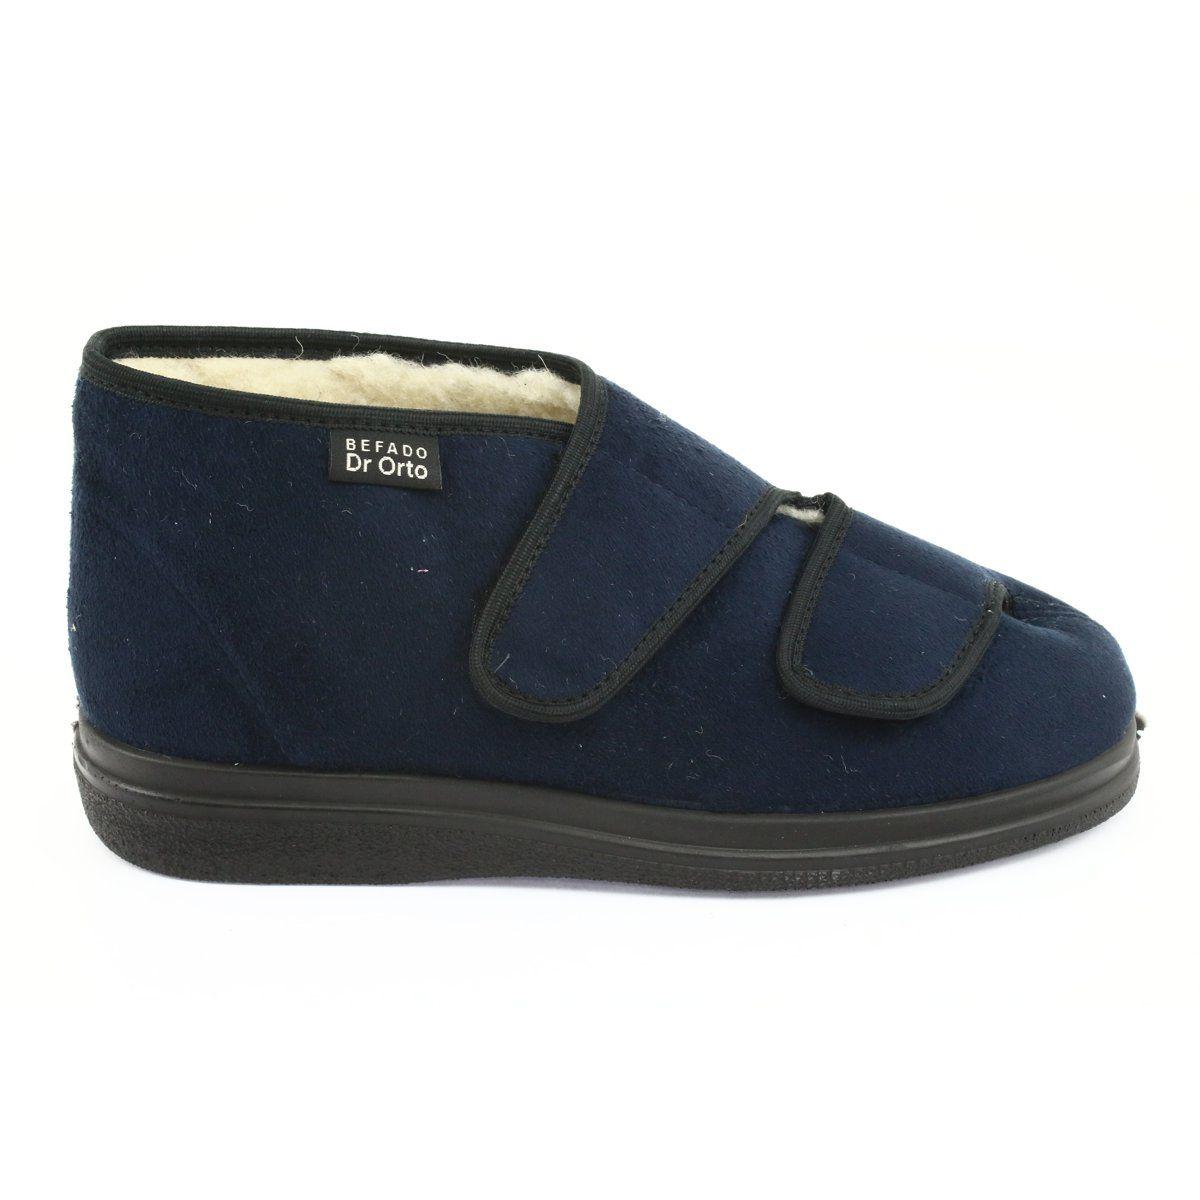 Befado Obuwie Damskie Pu 986m010 Granatowe Shoes Sneakers Fashion